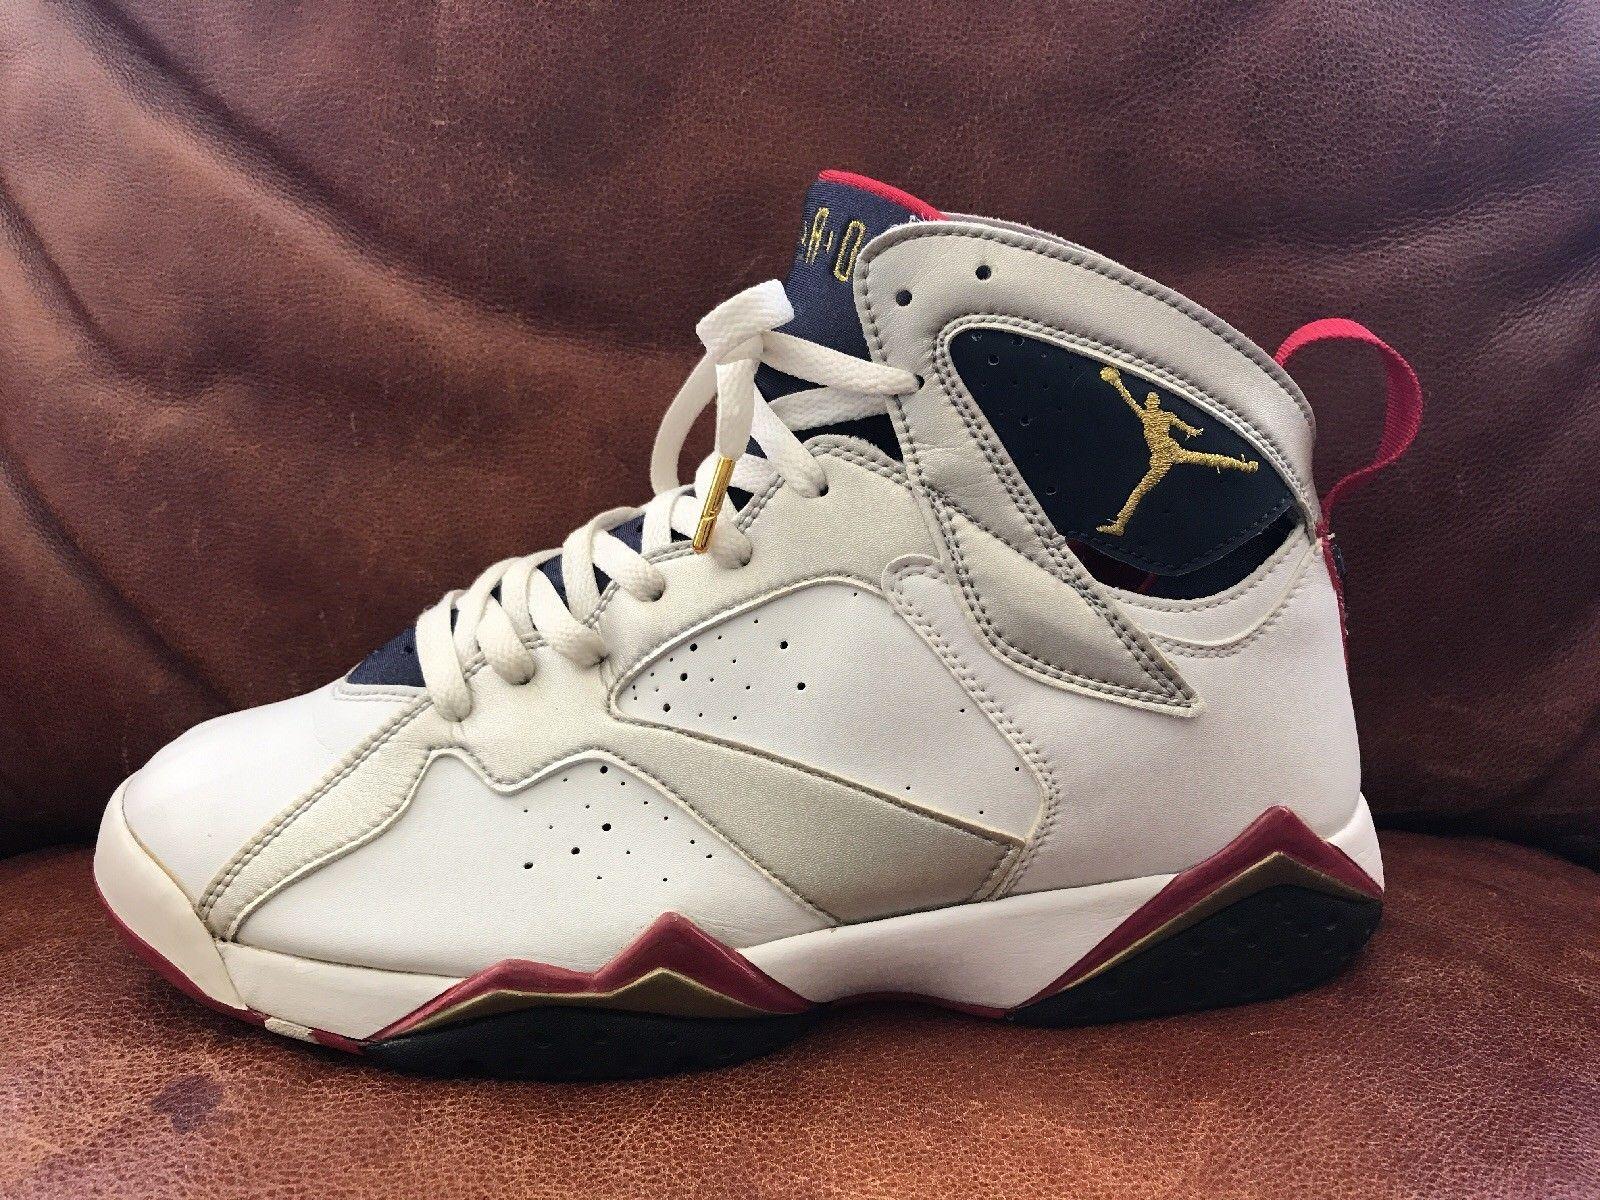 Nike Air Jordan 7 VII Retro OLYMPIC 2004 Size 10.5 304775 171 Roached Kicks